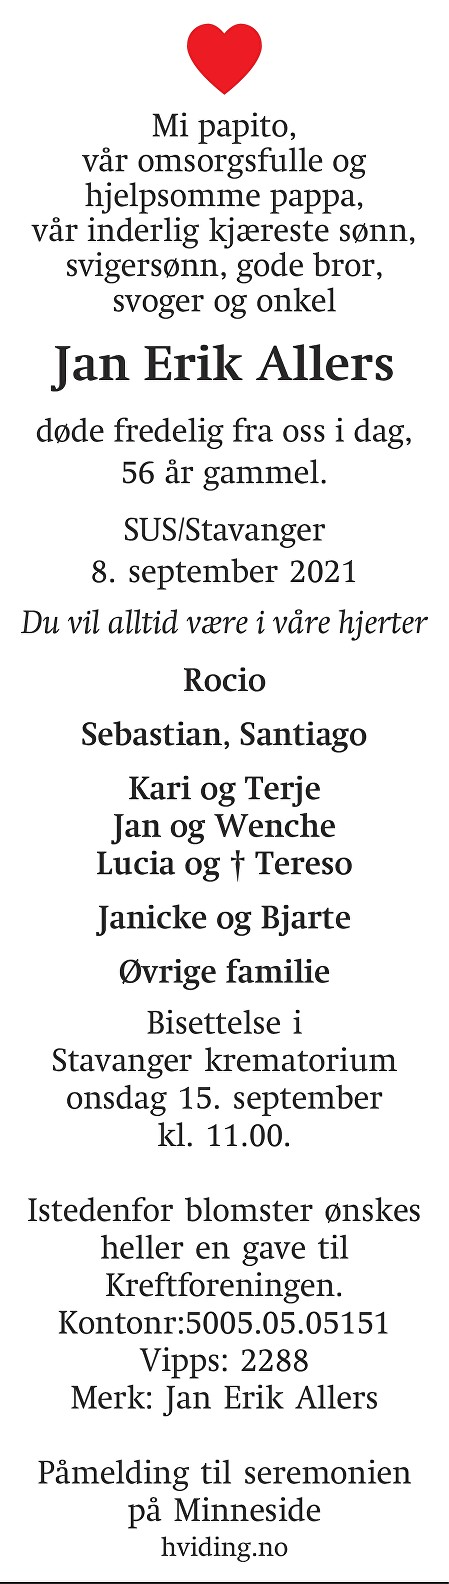 Jan Erik Allers Dødsannonse